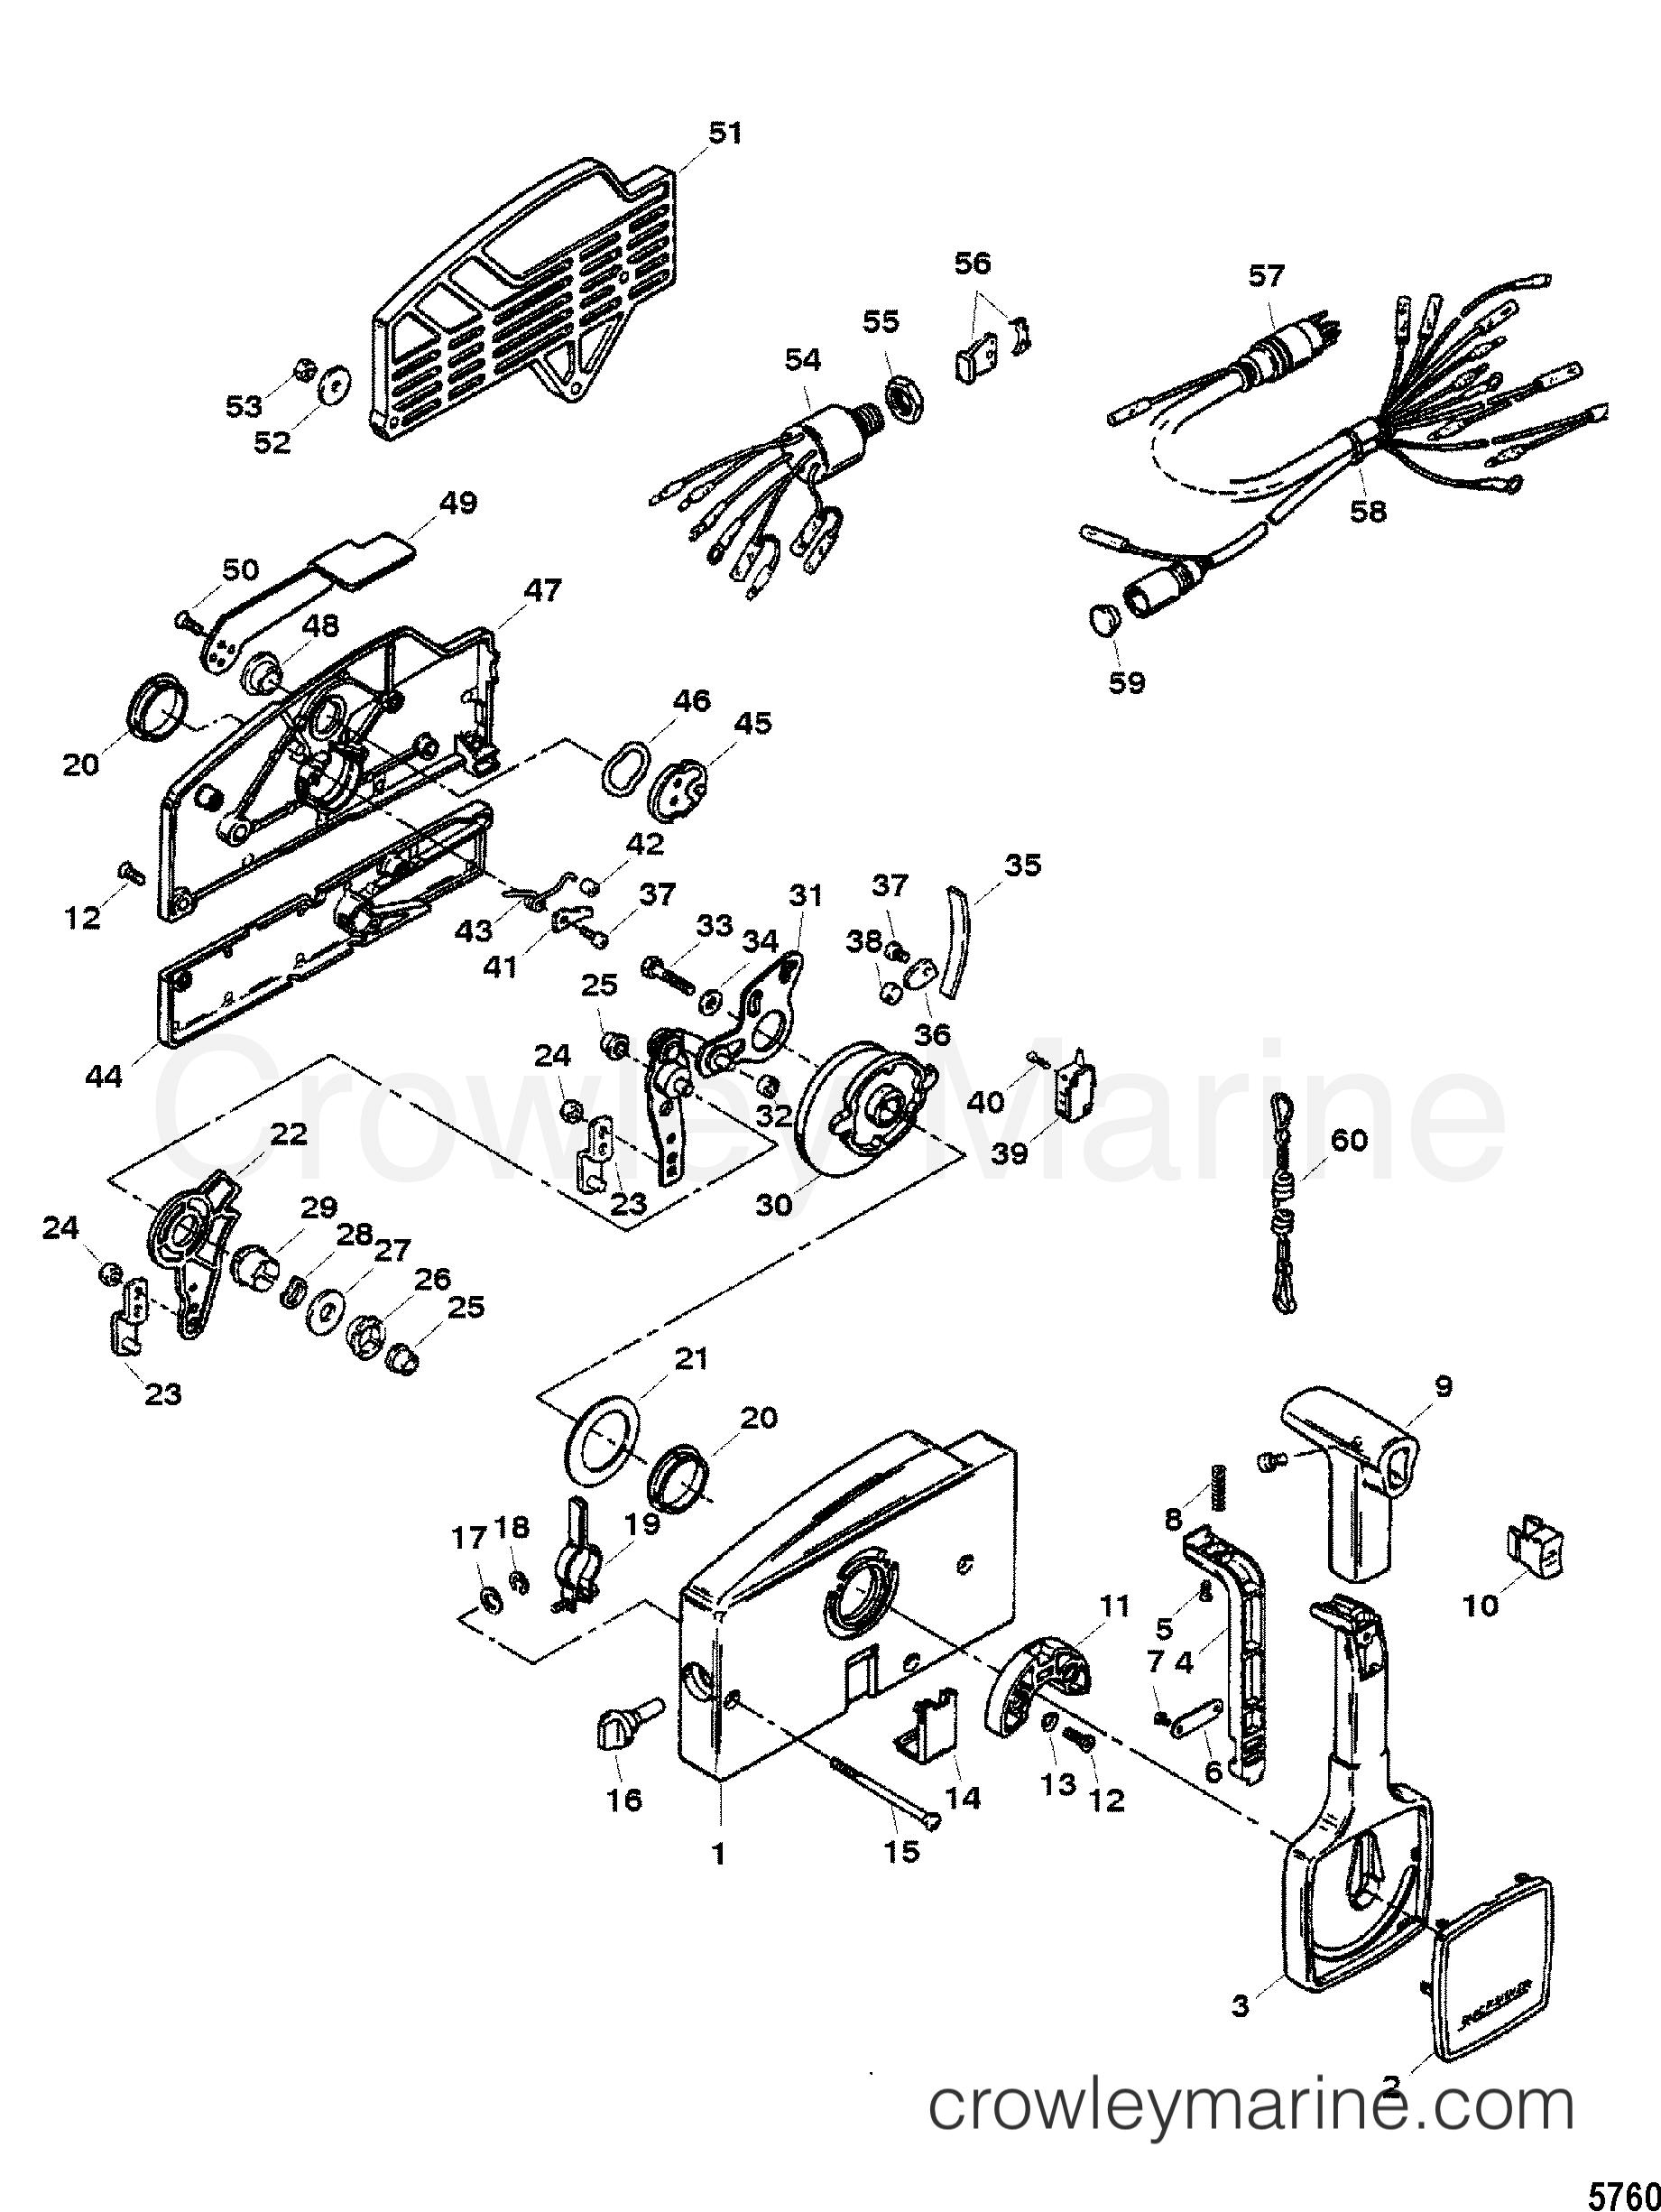 edelbrock quicksilver carburetor diagram pj dump trailer wiring parts source